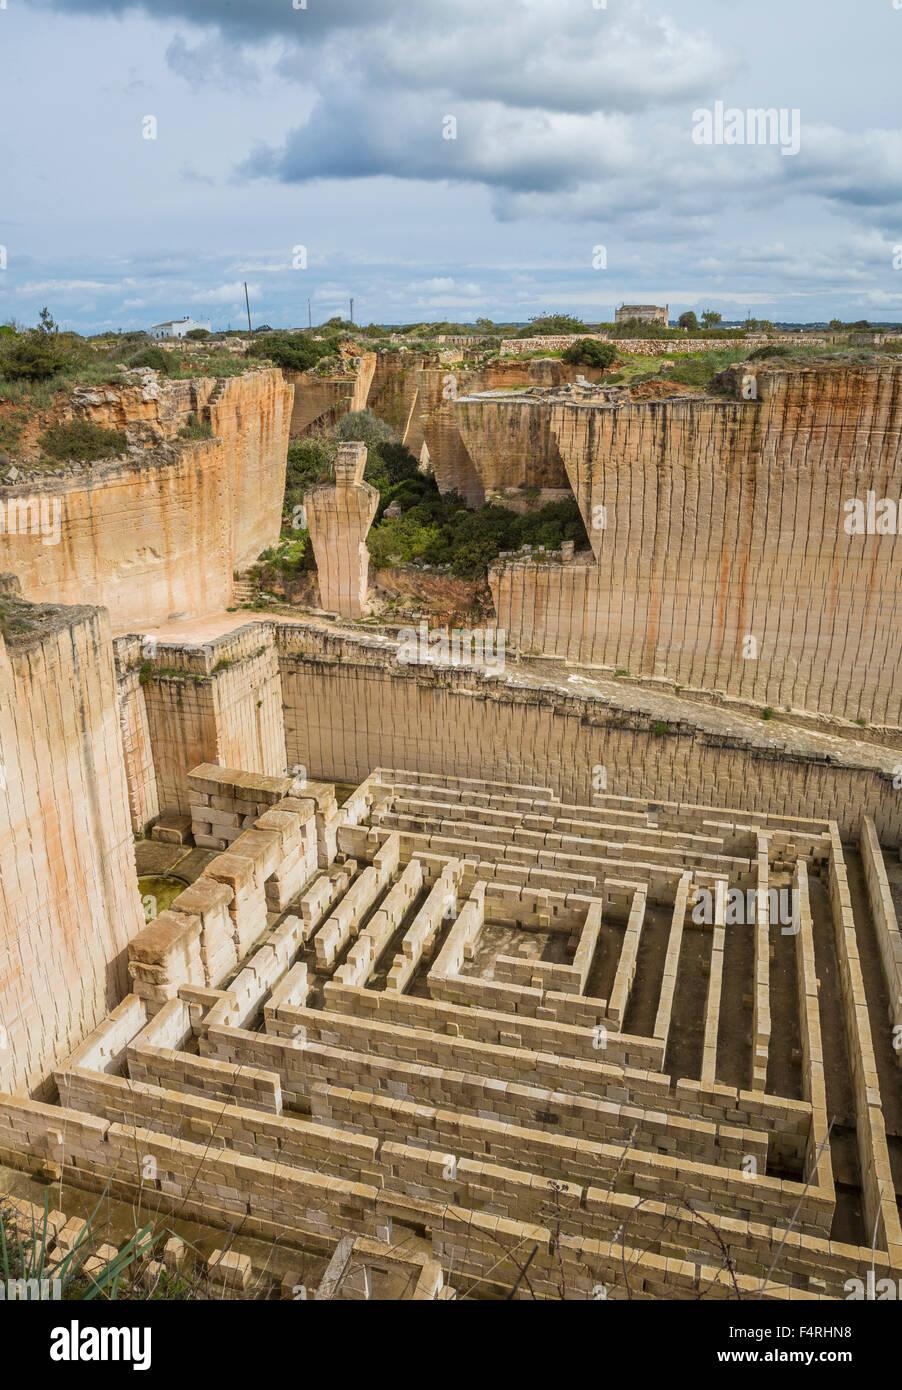 Ciutadella, Stadt, Lithica, Menorca, Insel, Spanien, Europa, S'Hostal, Architektur, Balearen, groß, tief, Stockbild